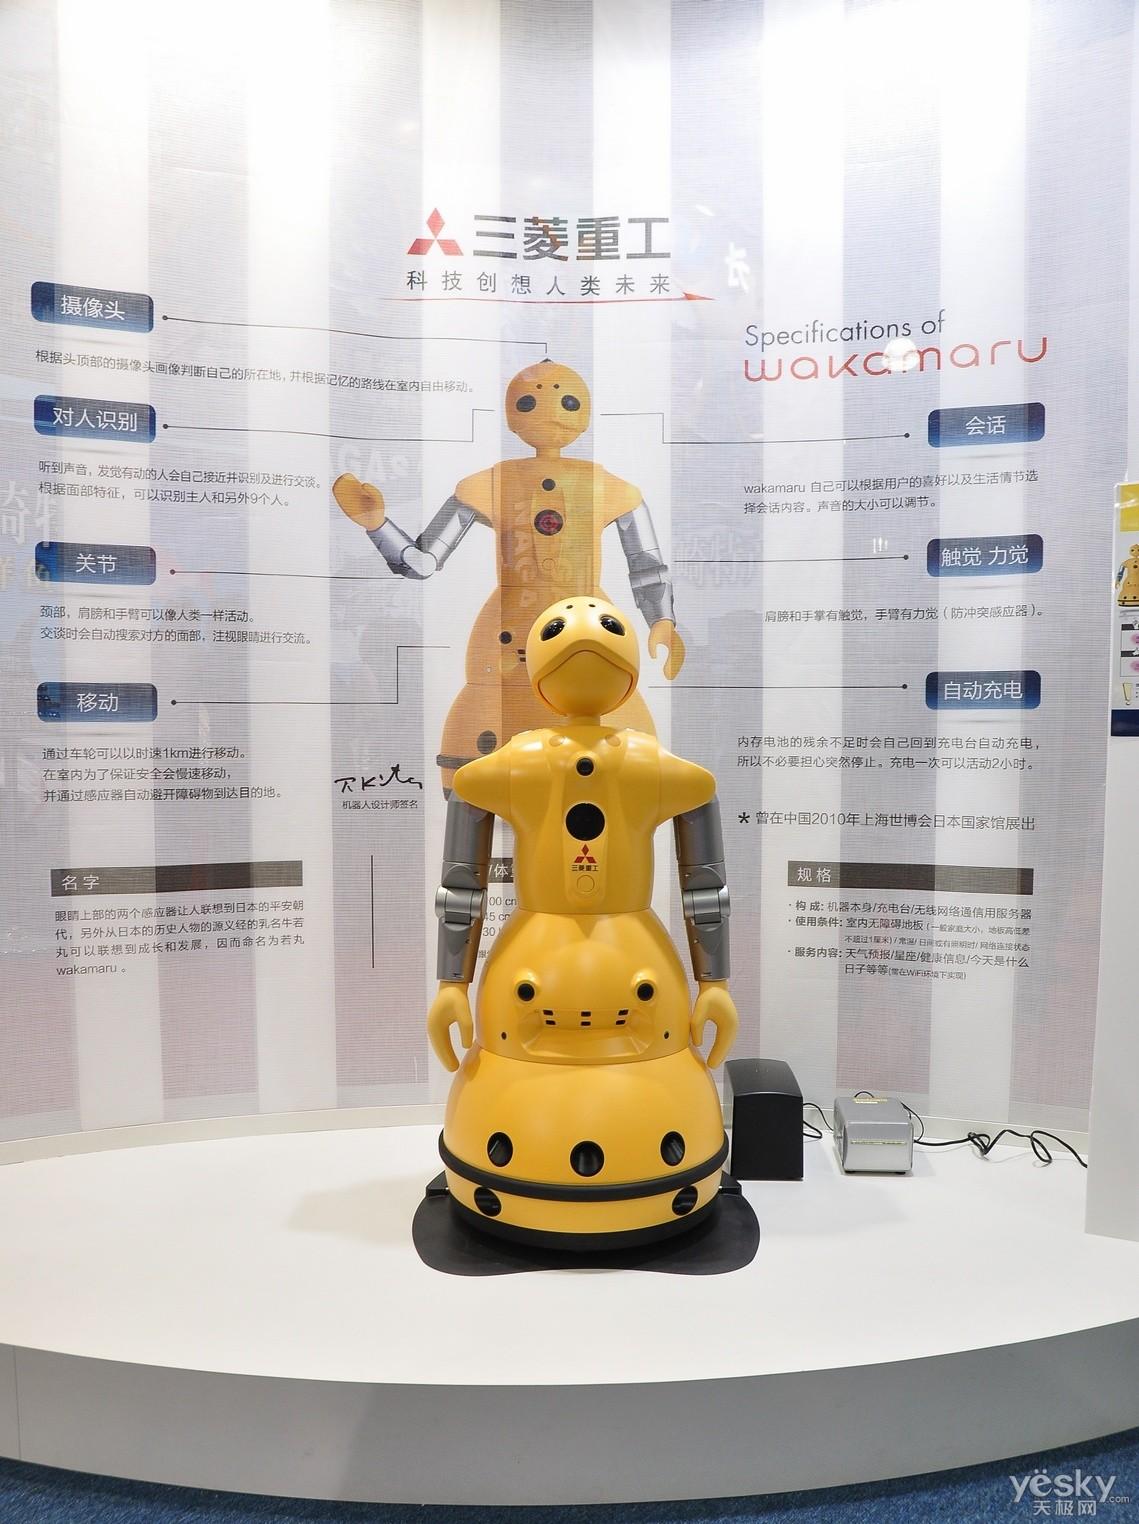 三菱重工智能机器人wakamaru